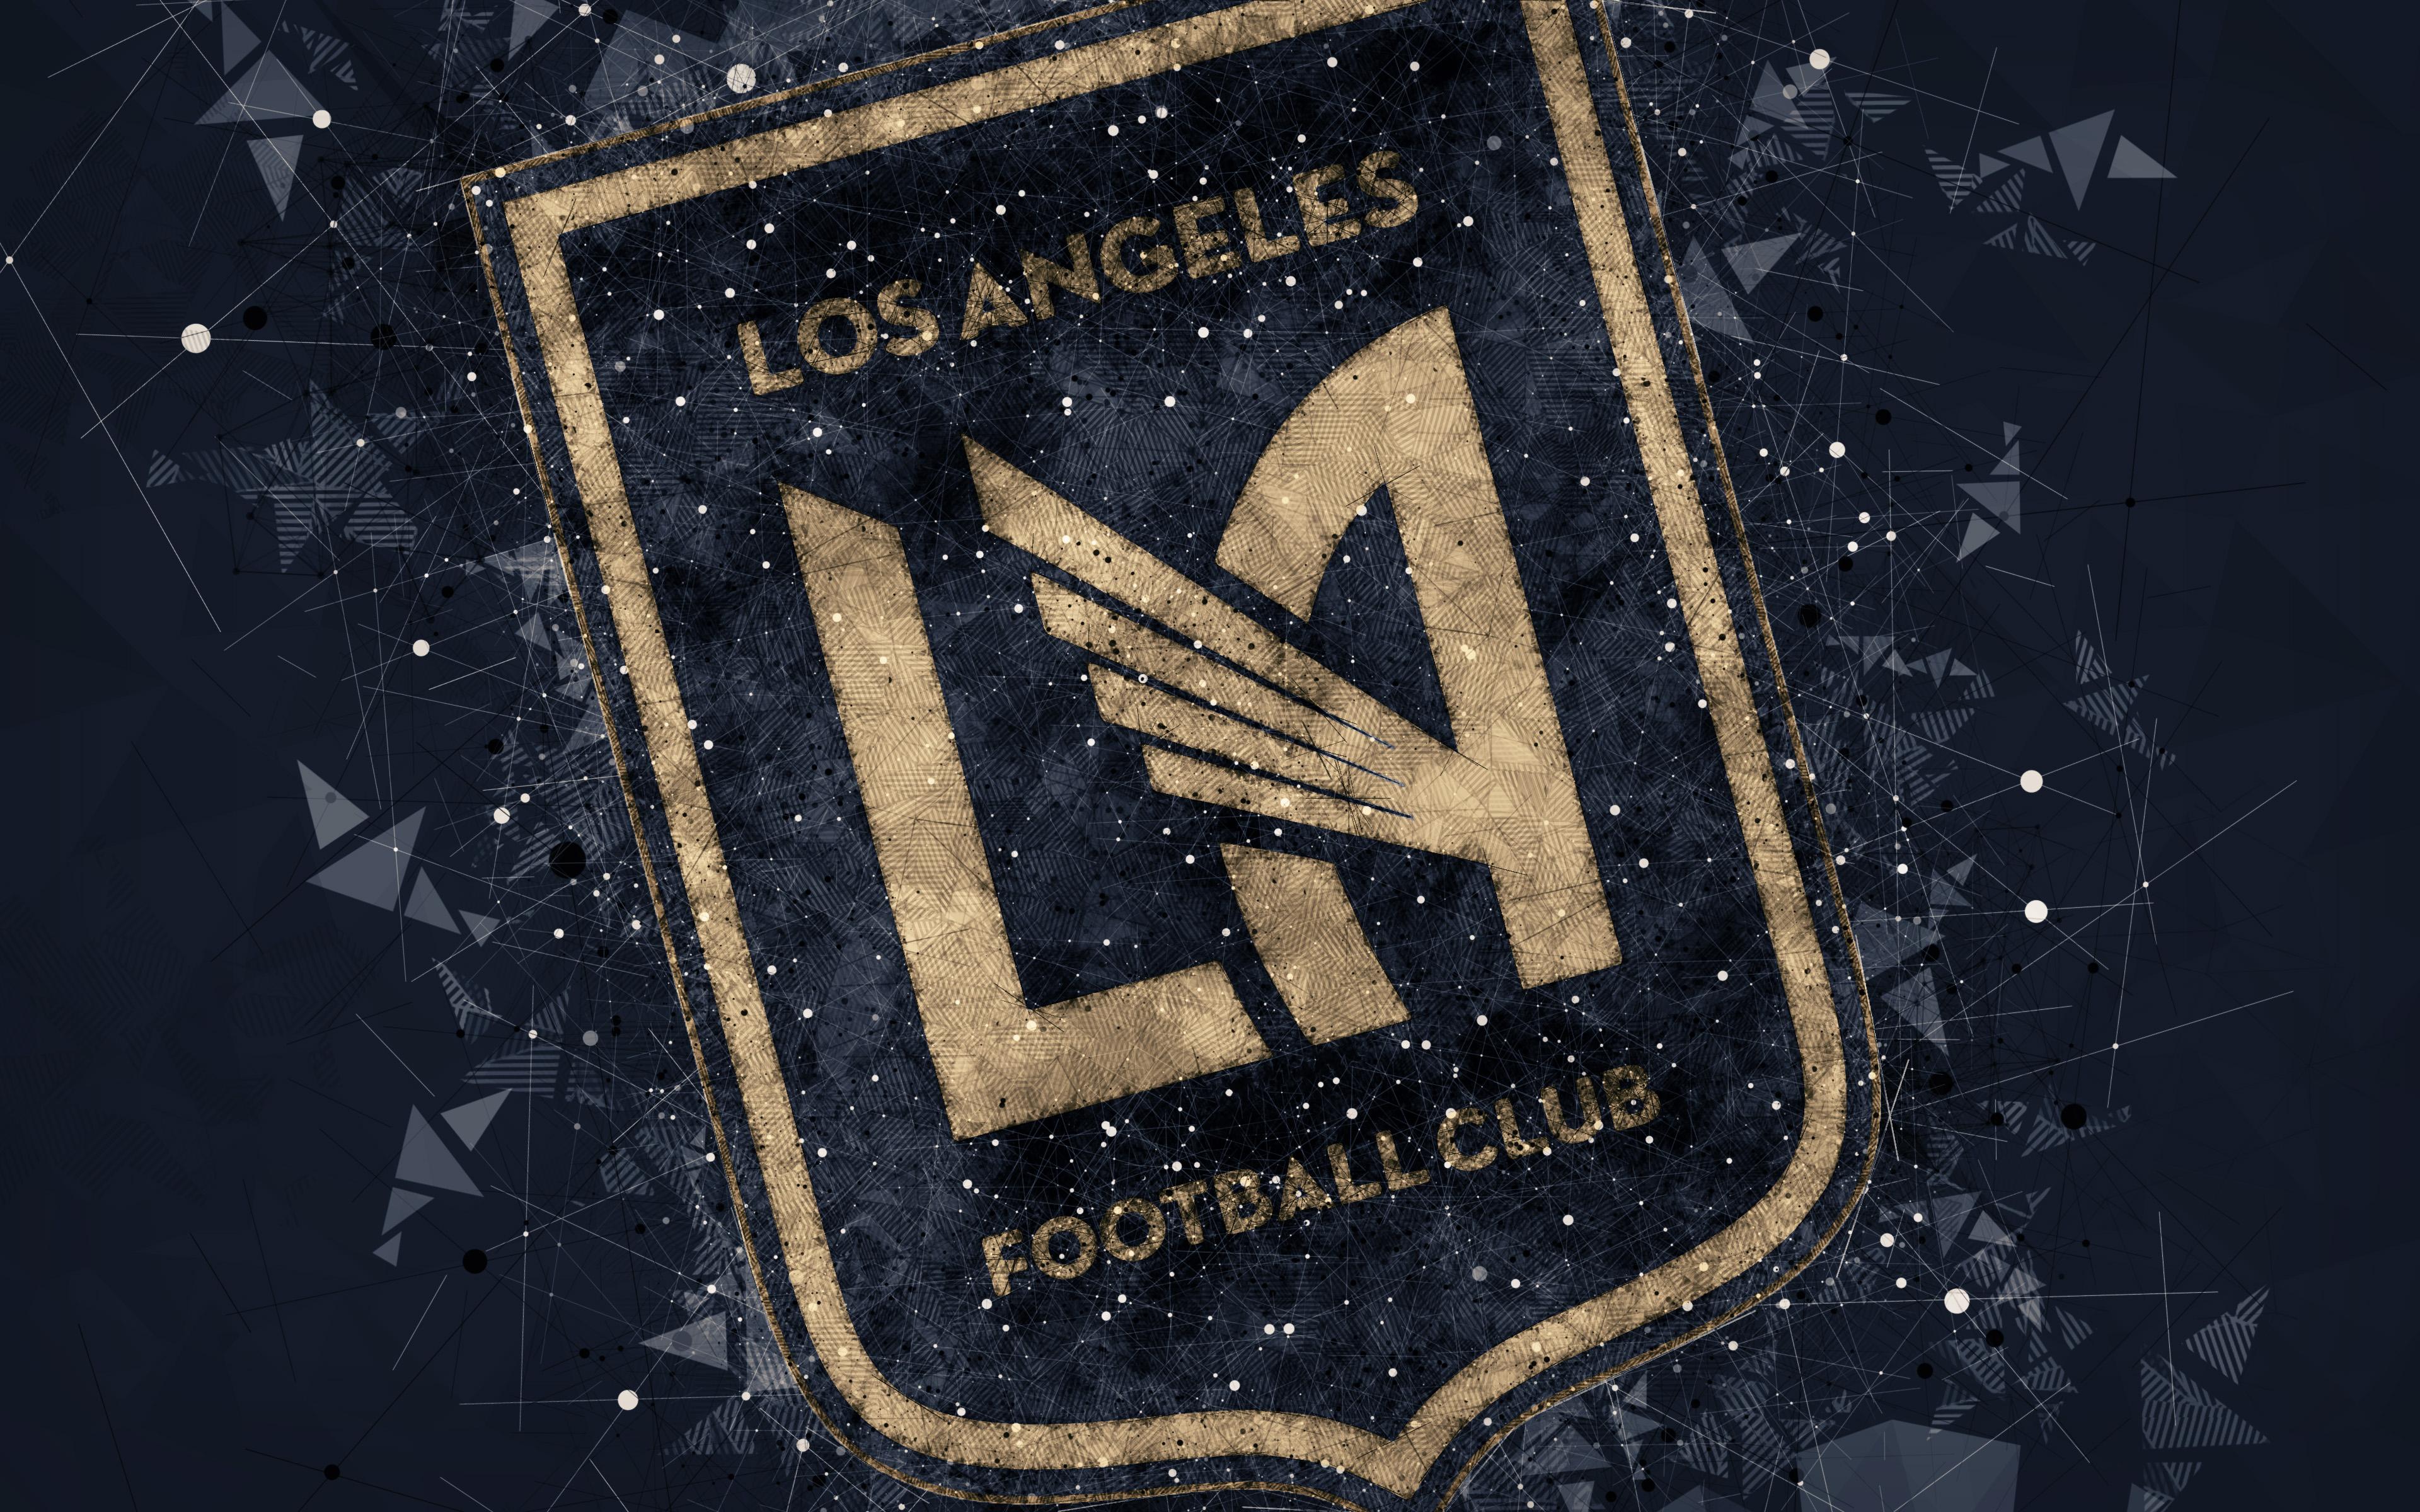 Los Angeles Football Club Logo 4k Ultra Hd Wallpaper